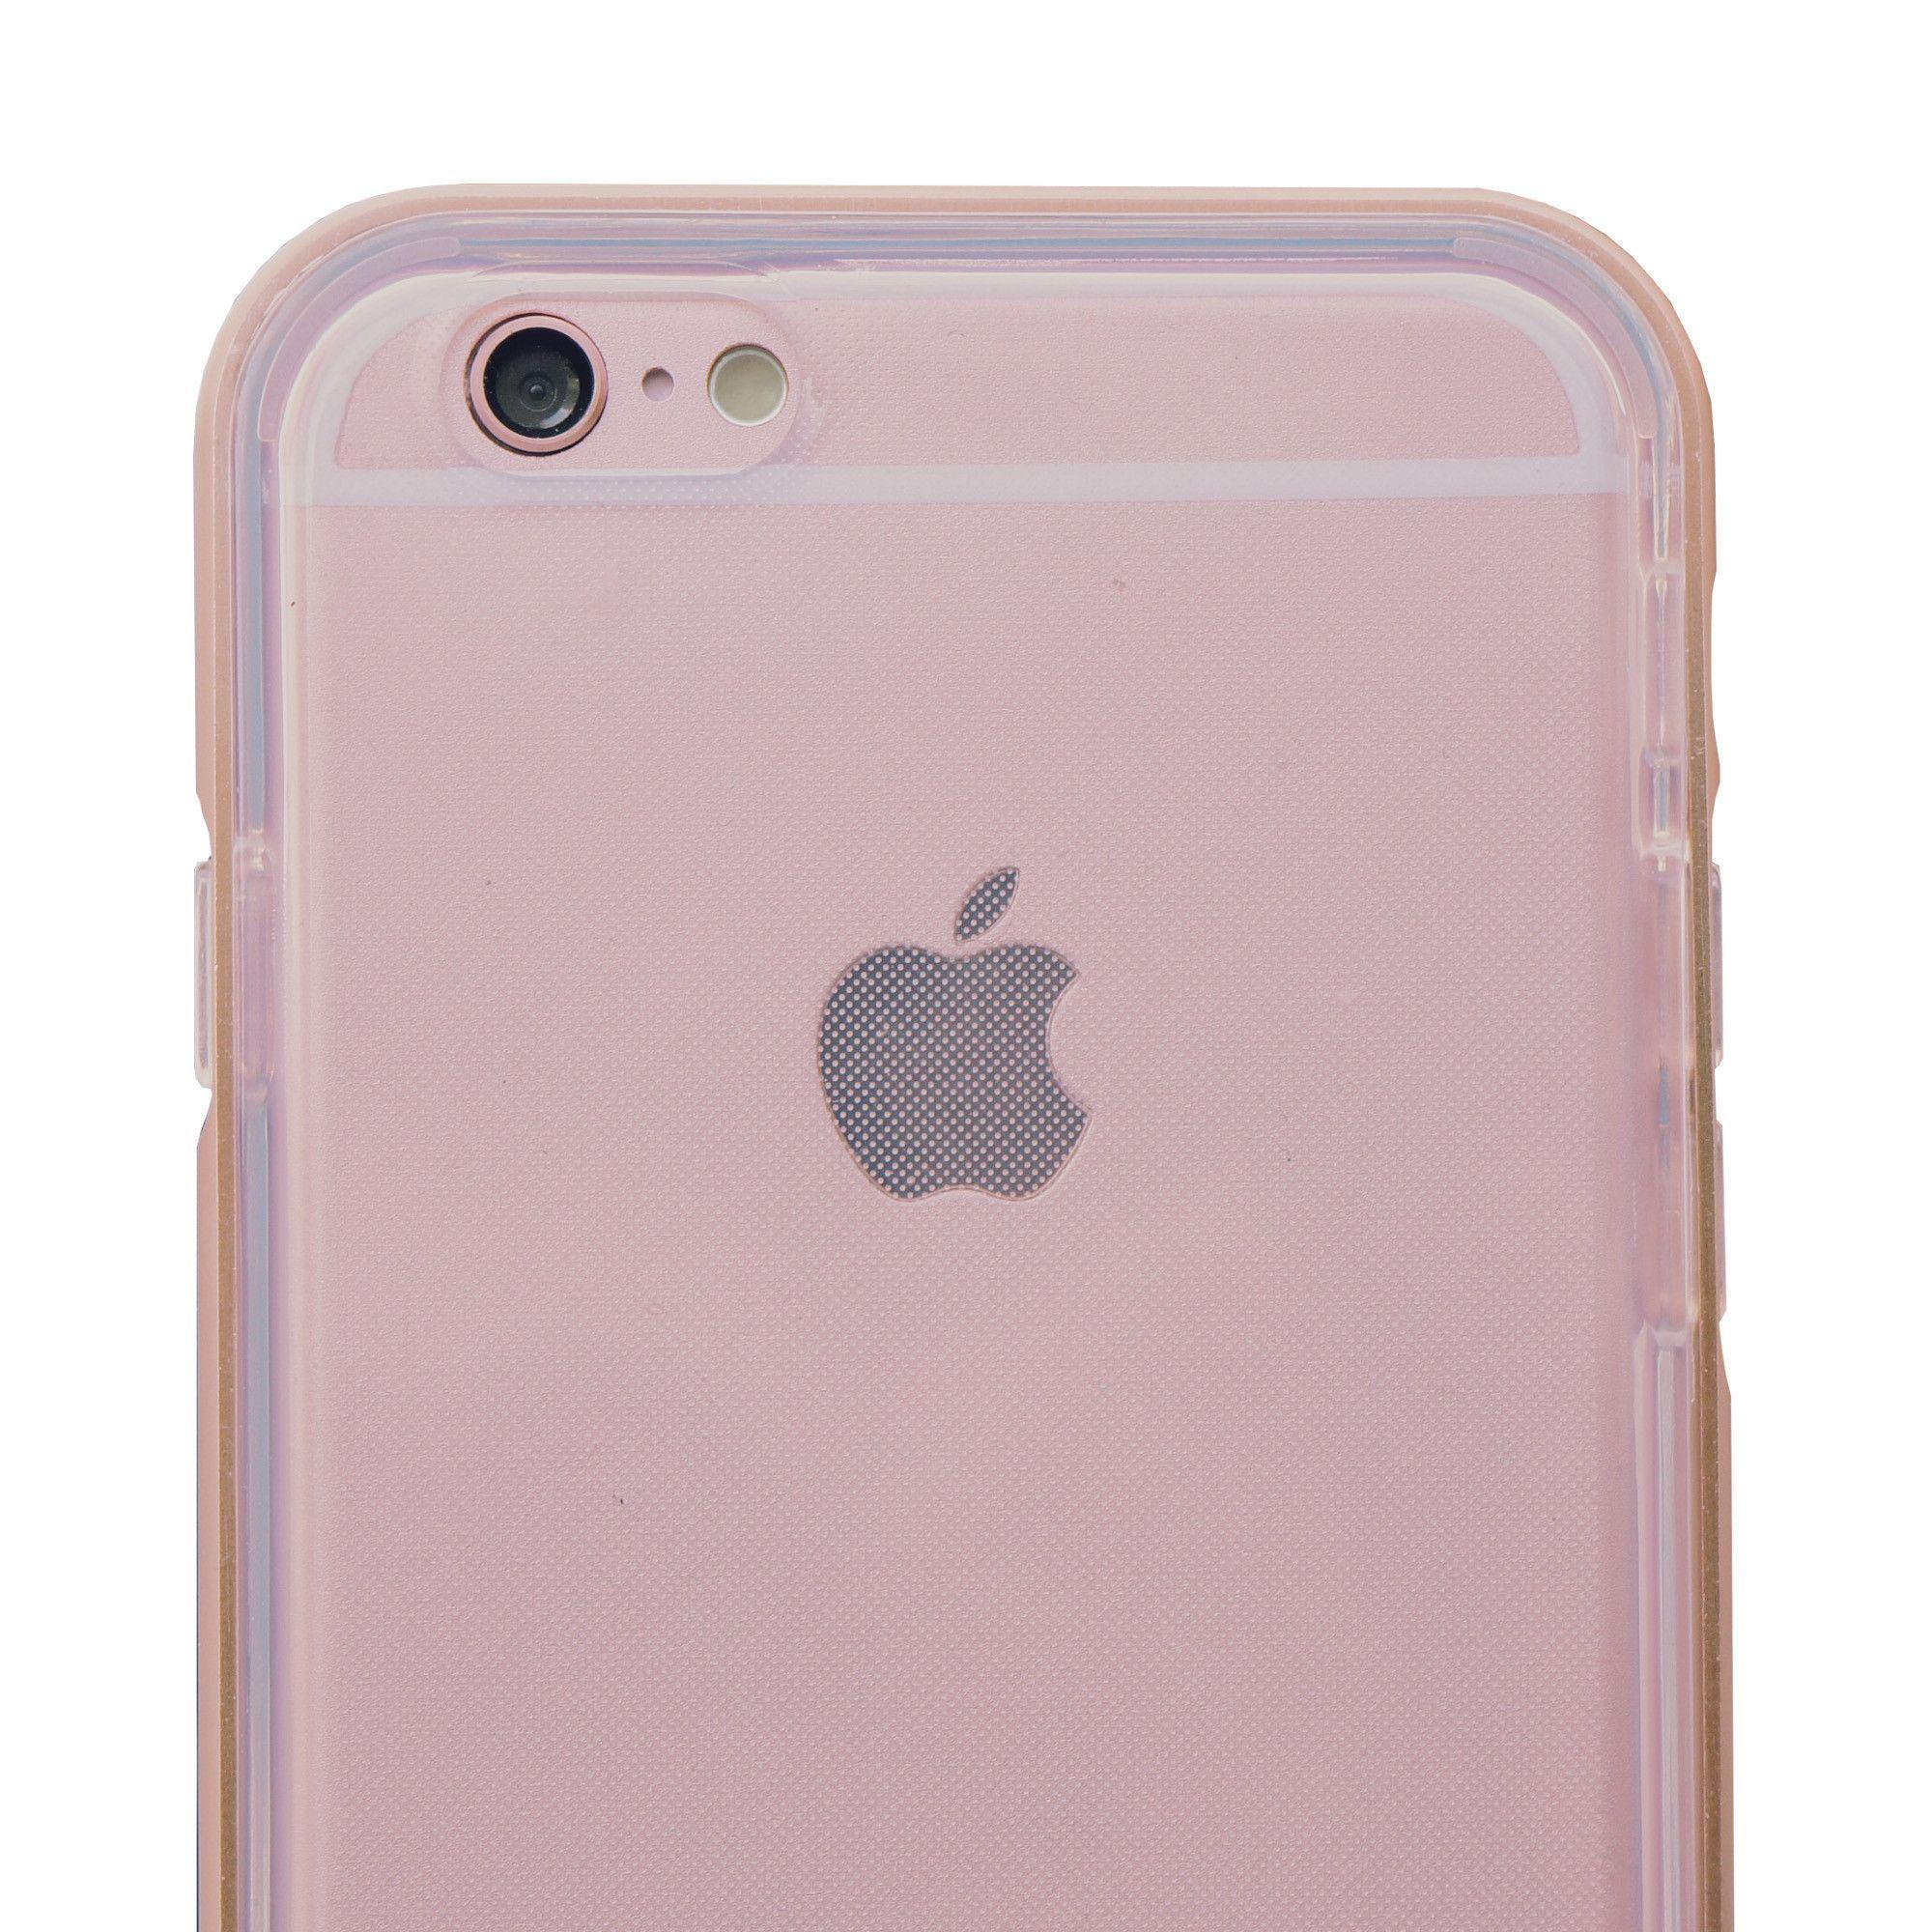 Hybrid Case for iPhone - Rose Smoke